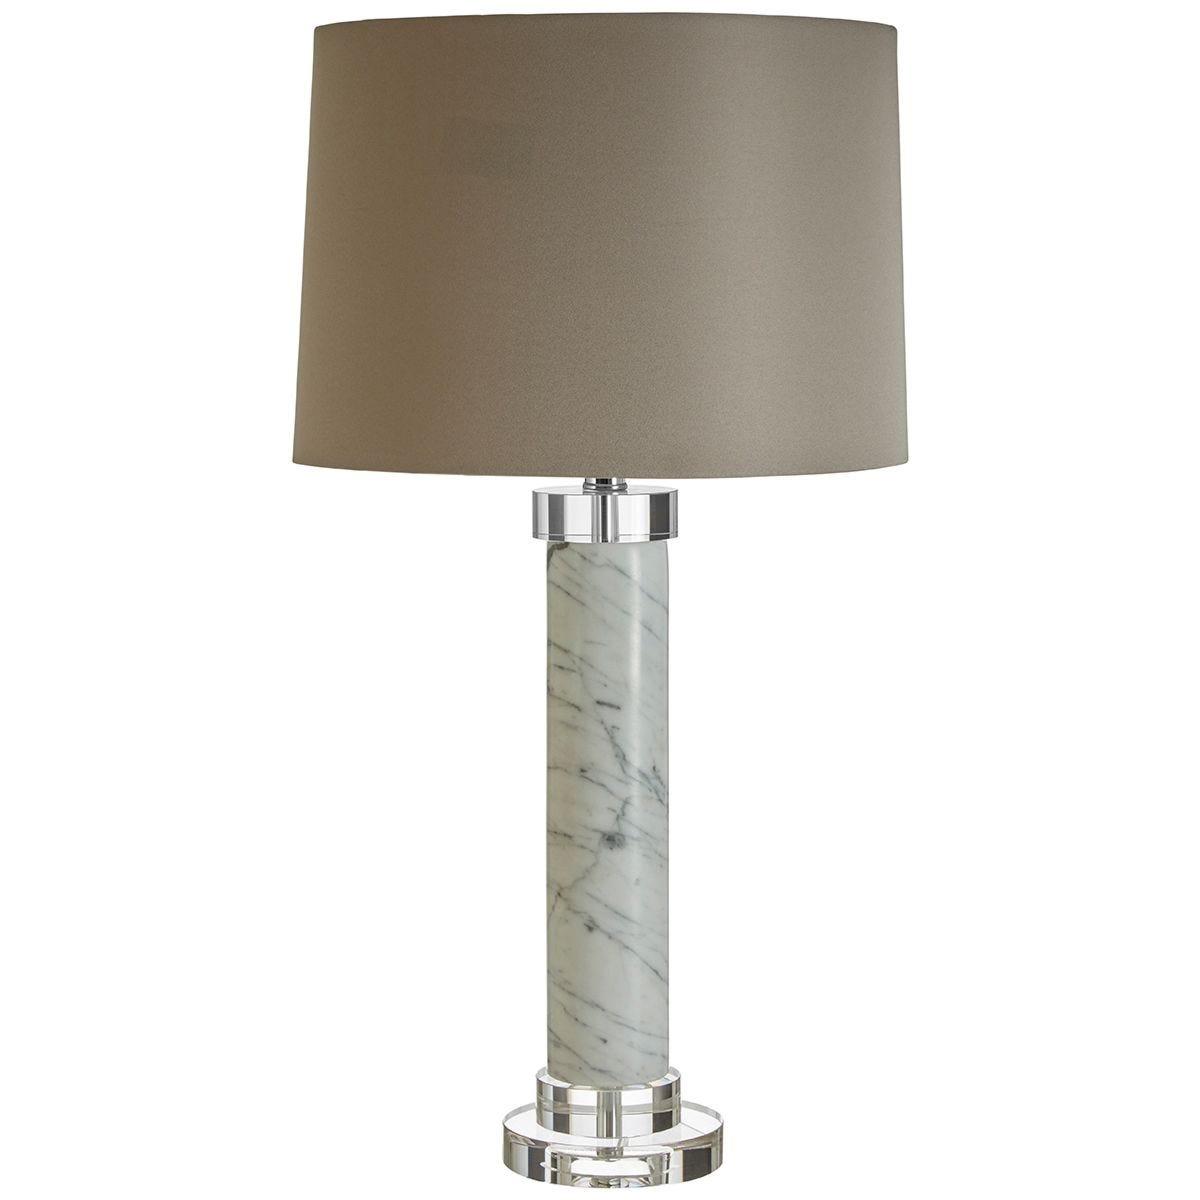 Premier Housewares Ursina Table Lamp with Marble Base & Grey Fabric Shade